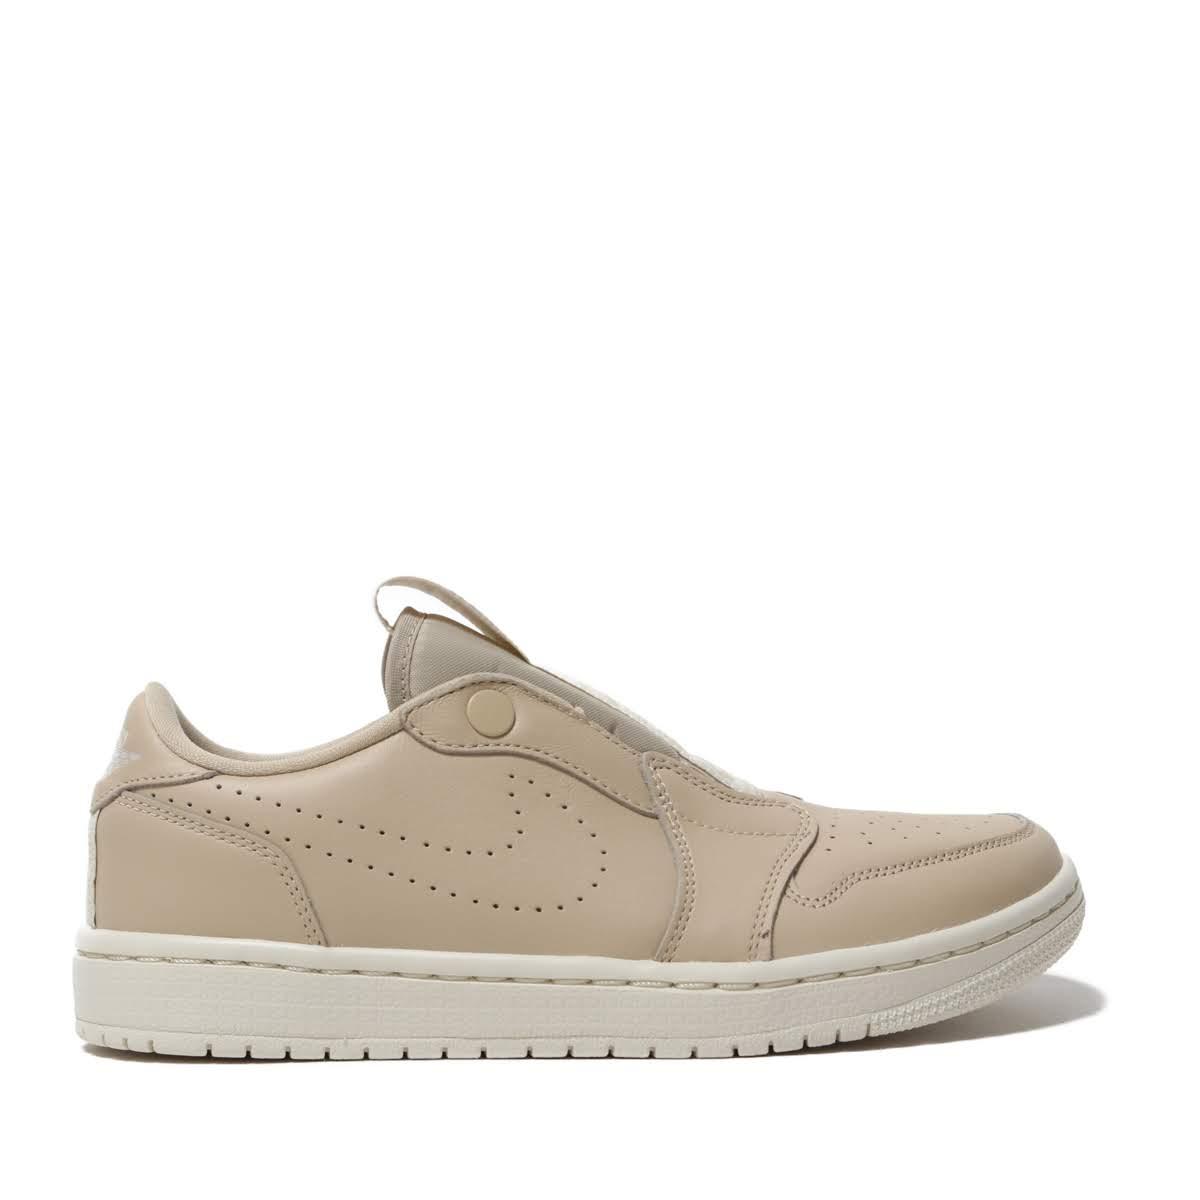 NIKE WMNS AIR JORDAN 1 RET LOW SLIP (DESERT ORE LIGHT CREAM) (Nike women Air  Jordan 1 nostalgic sirloin lip) b103d58b6